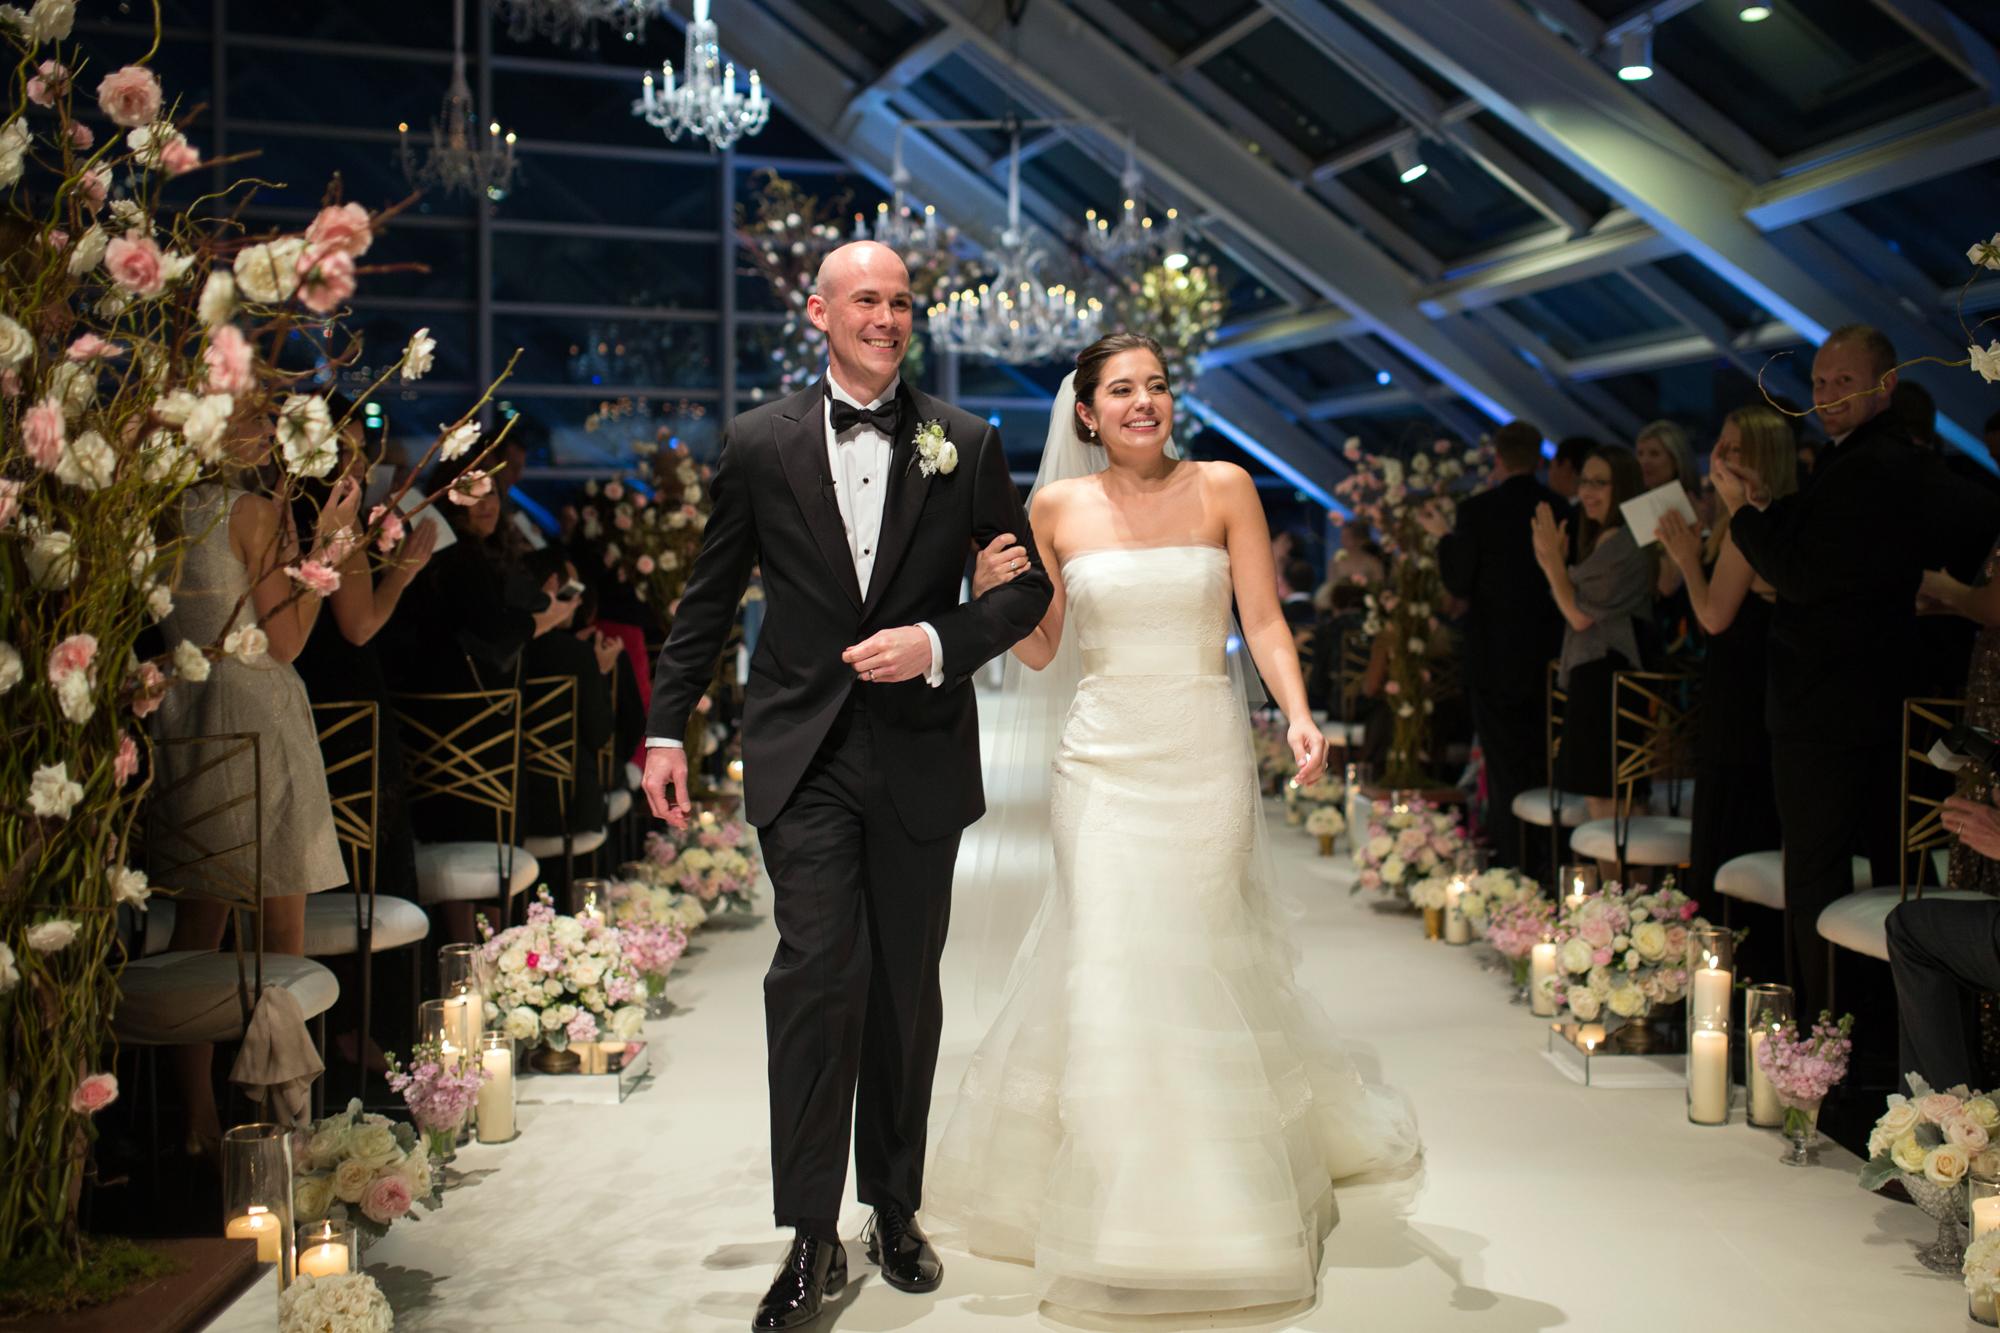 Bride and groom exit wedding ceremony at Adler Planetarium in Chicago.